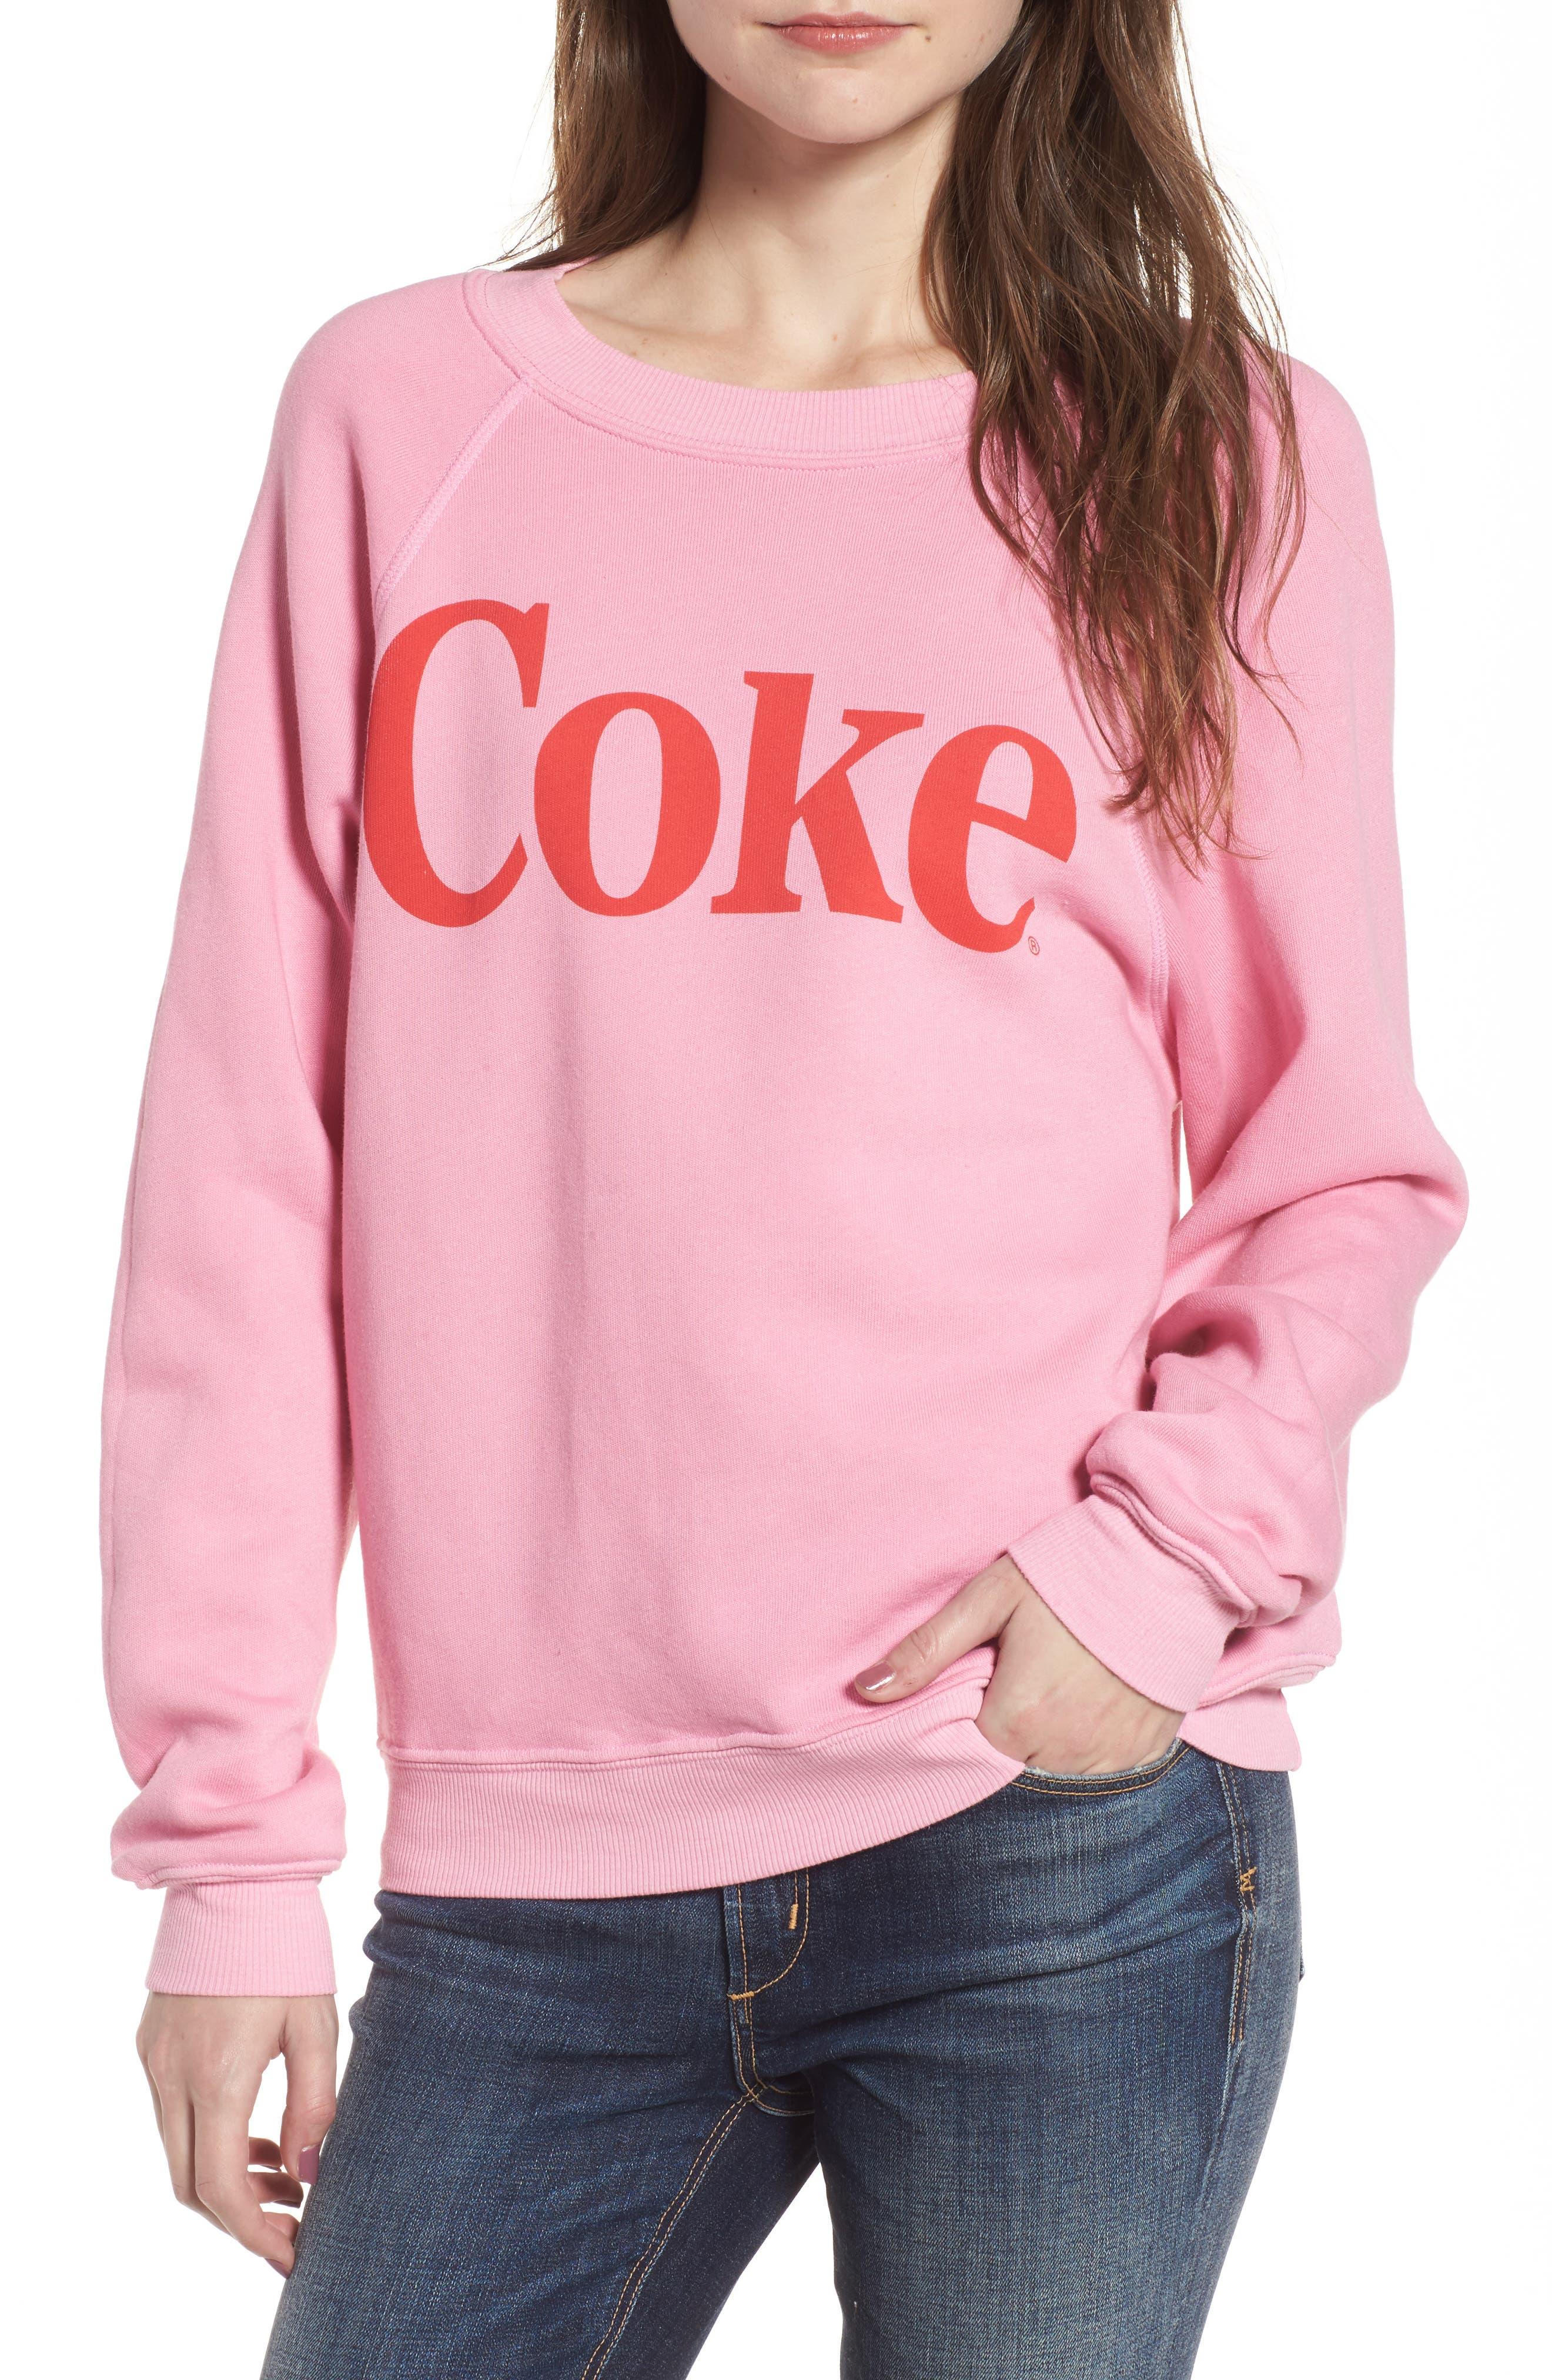 Wildfox Classic Coke® Sweatshirt